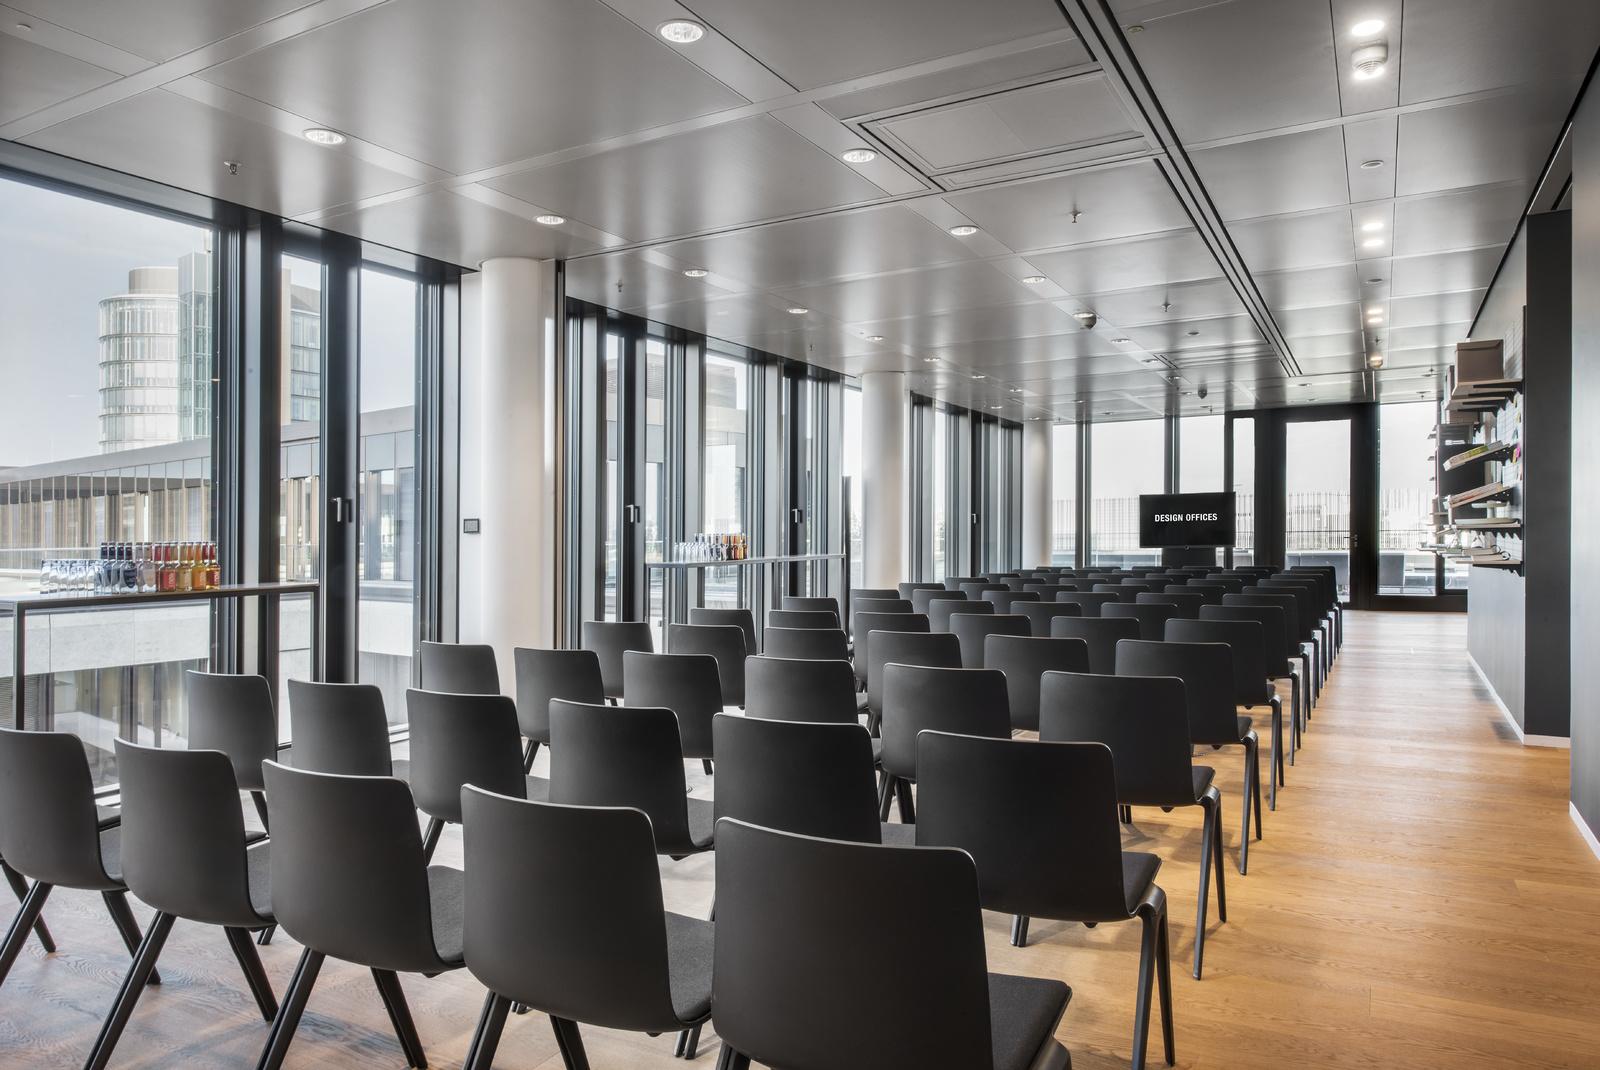 Design Offices München Nove - Eventlocation - fiylo